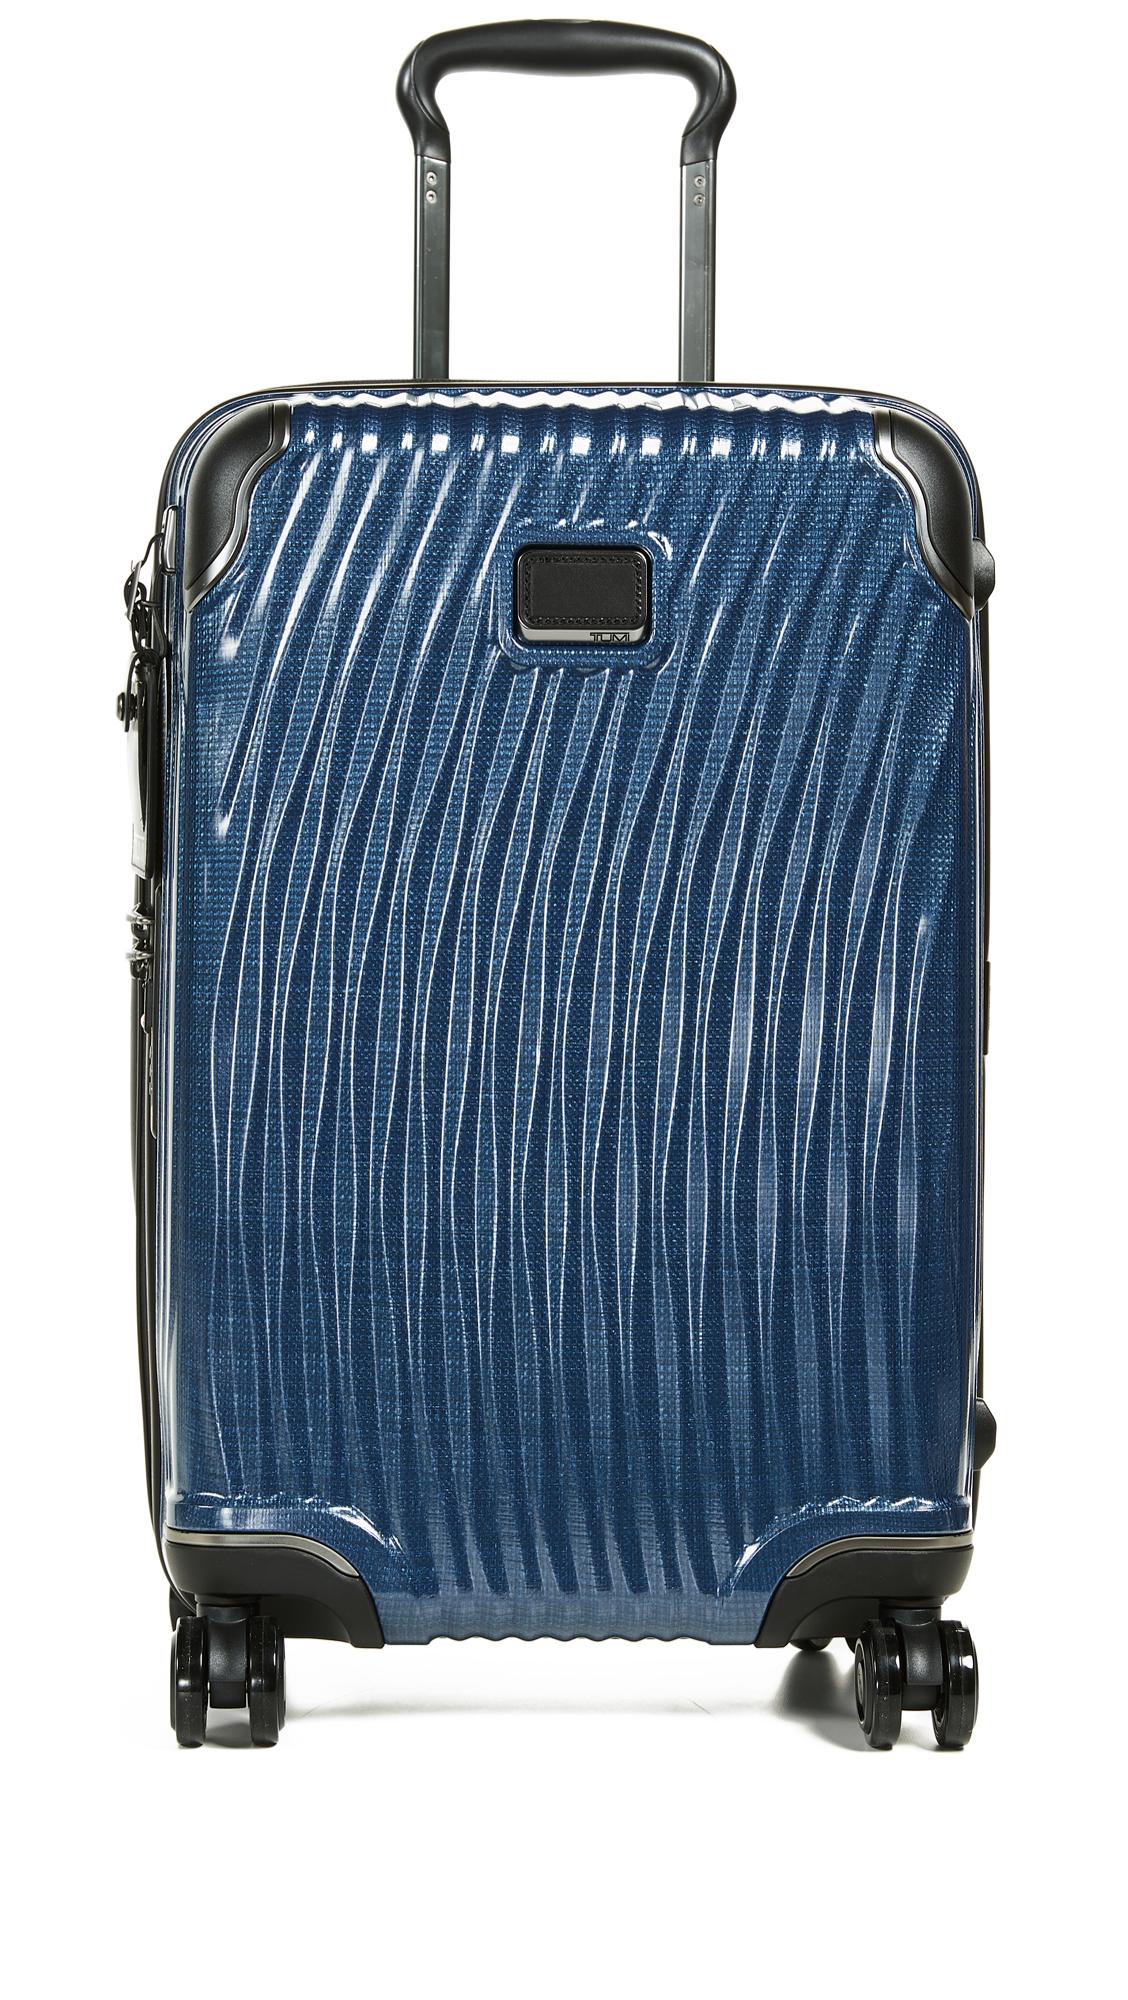 Tumi Suitcases LATITUDE INTERNATIONAL CARRY ON SUITCASE